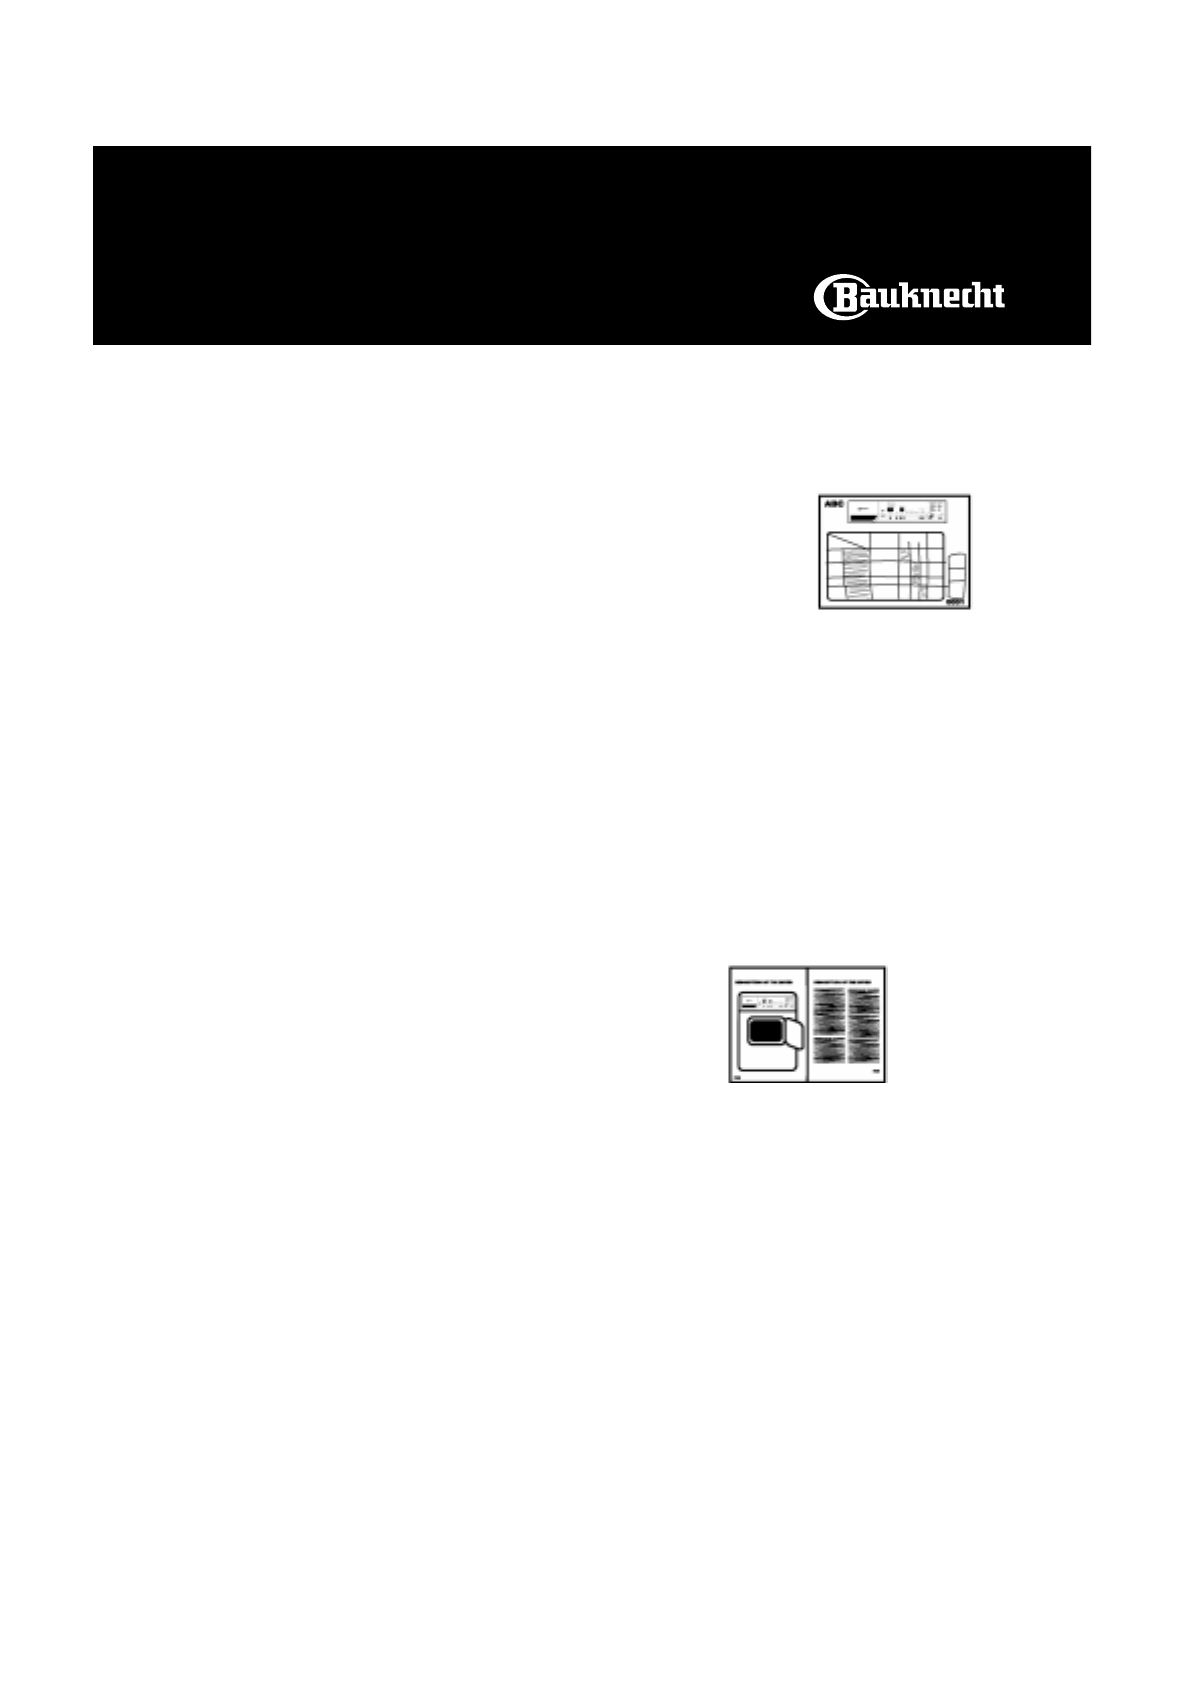 handleiding bauknecht trak stuttgart pagina 1 van 8 english. Black Bedroom Furniture Sets. Home Design Ideas